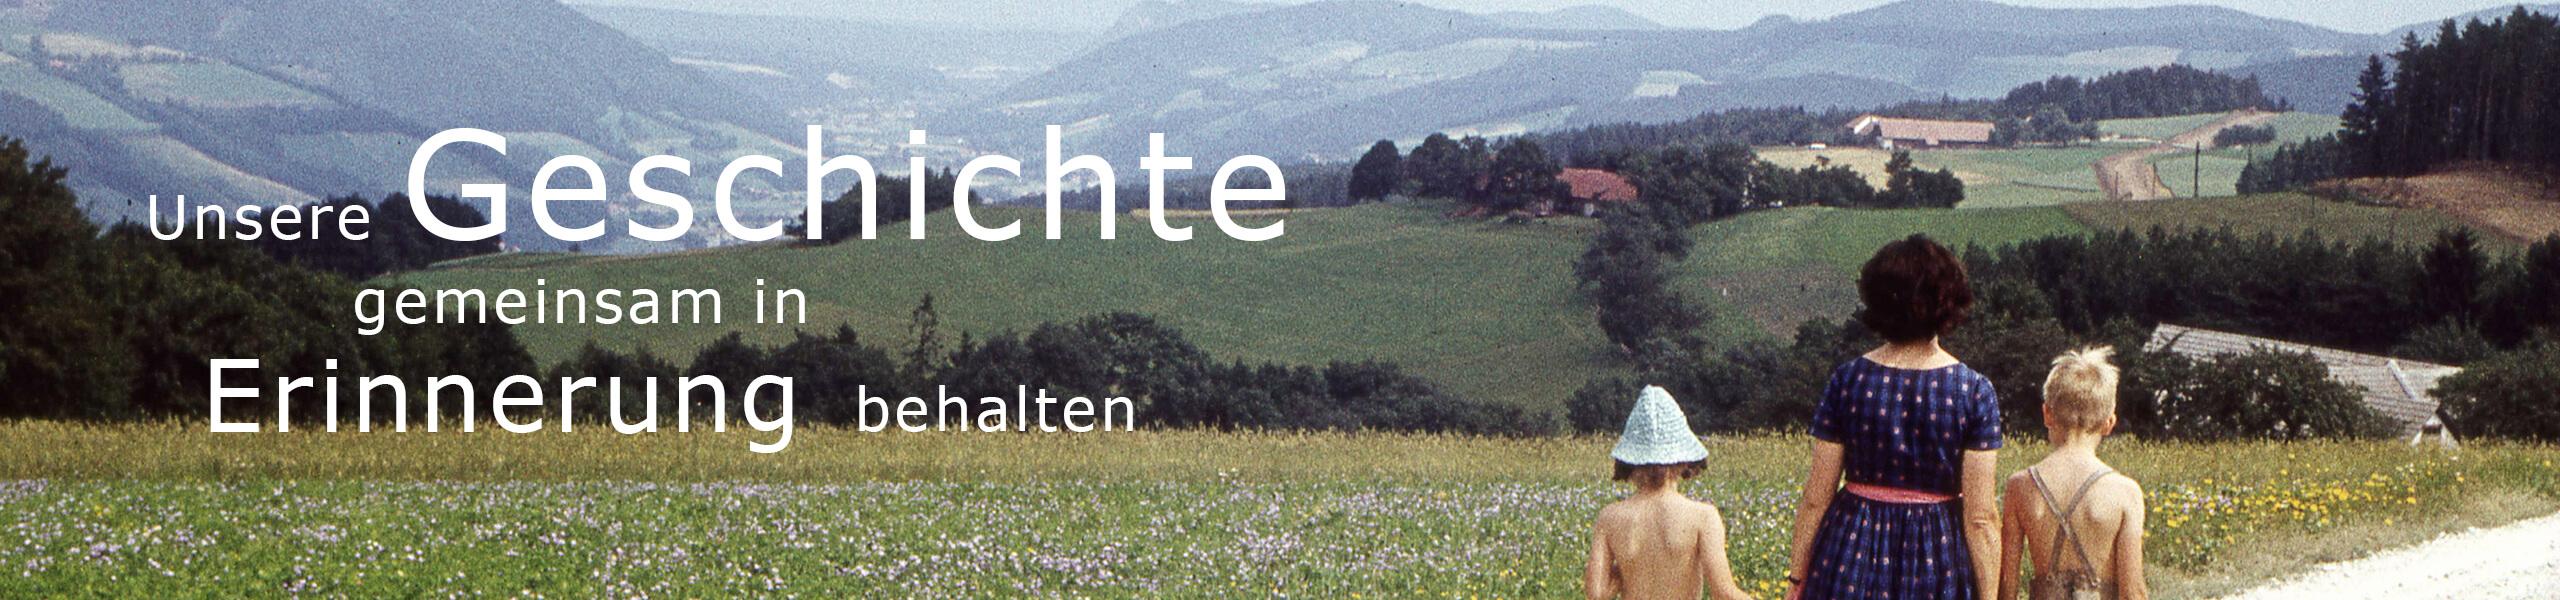 Topothek_Titelfoto_Landschaft_Text_1-3